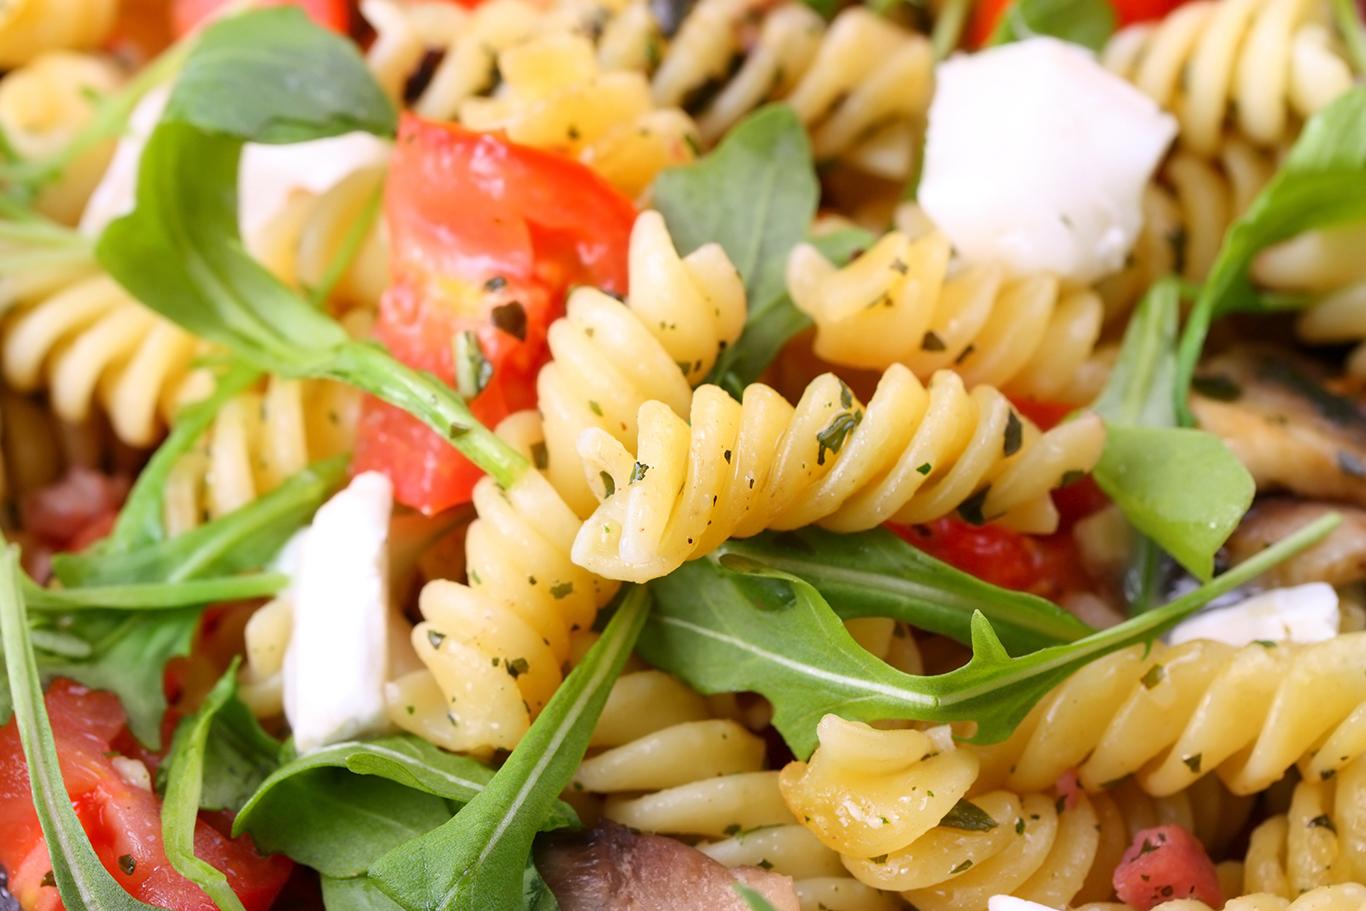 Arugula and Goat Cheese Pasta Salad Recipe